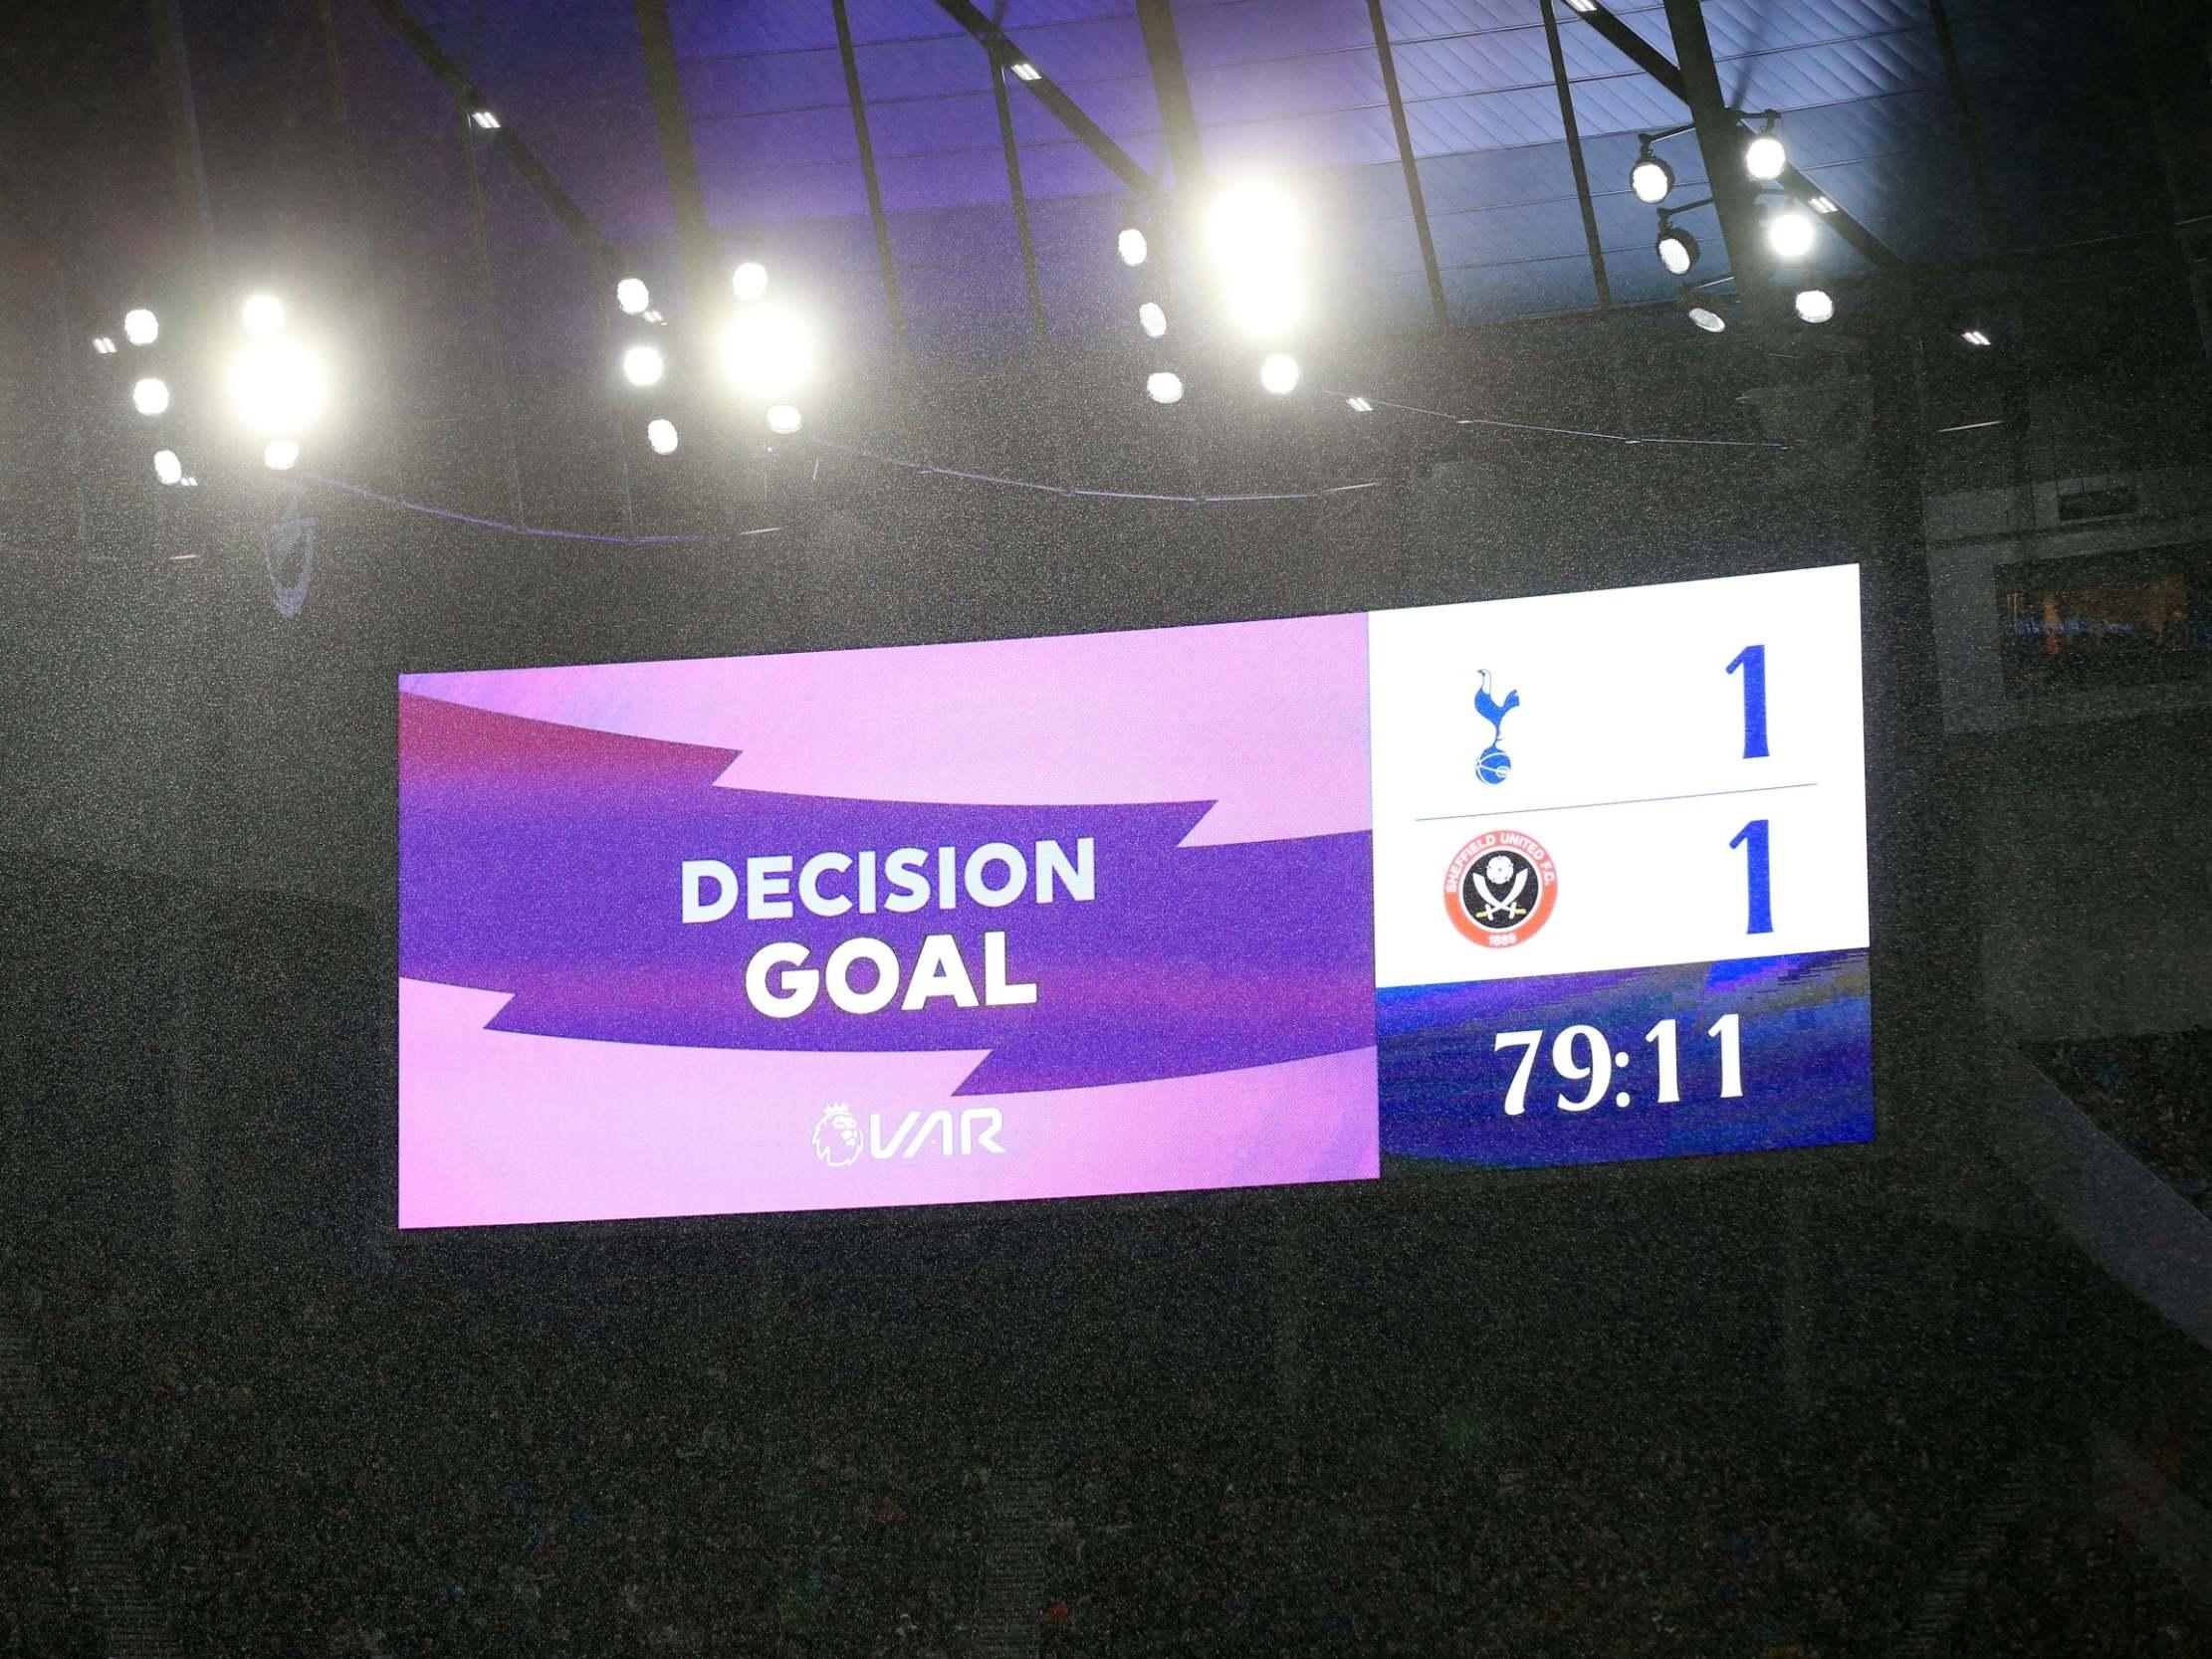 Premier League pledges to give fans more information during VAR checks